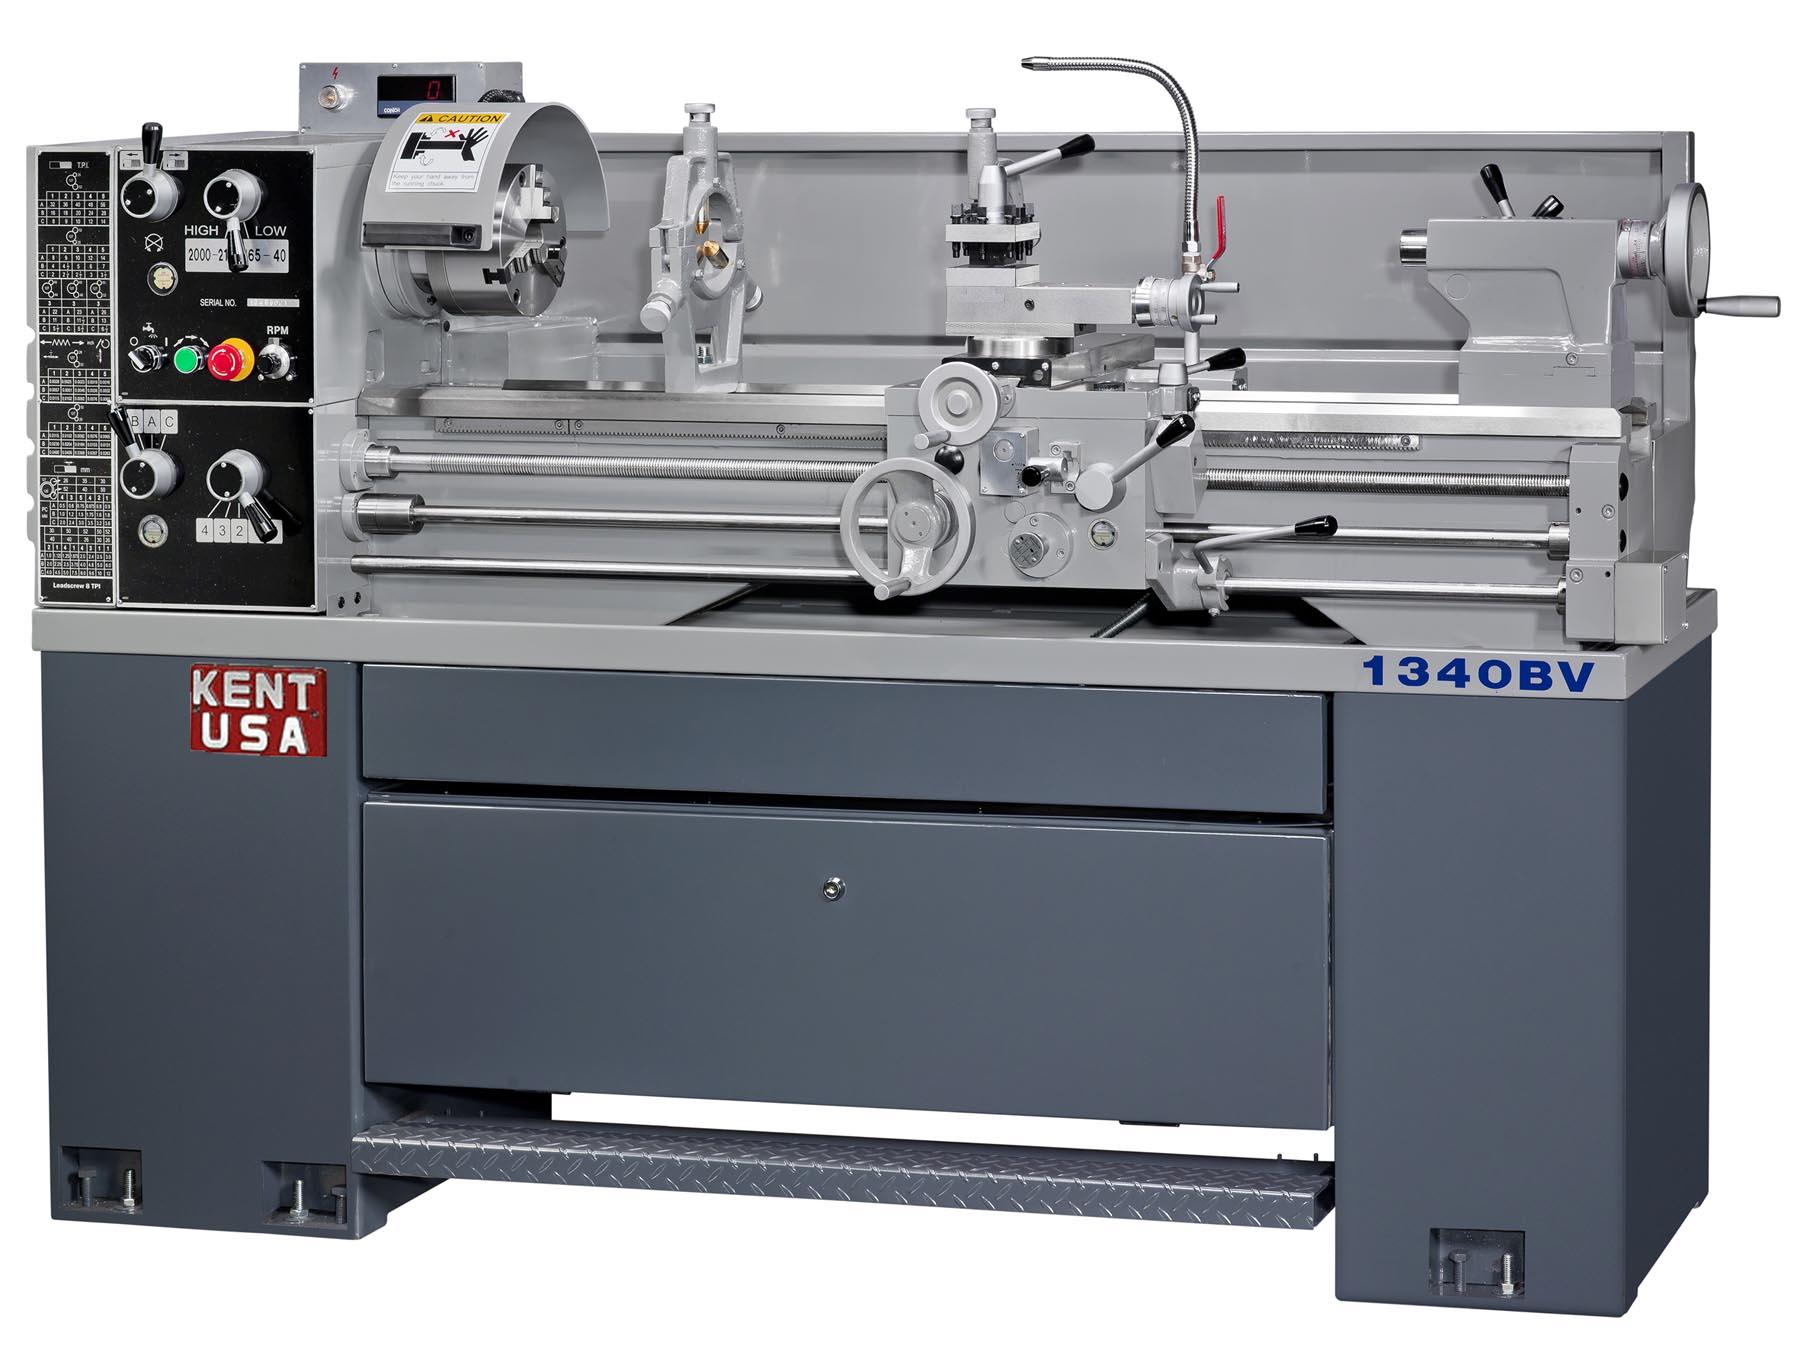 kent 13 x 40 manual precision lathe ssm 1340bv norman machine tool rh  normanmachinetool com Clausing Lathe Toolroom Lathe Machine Parts